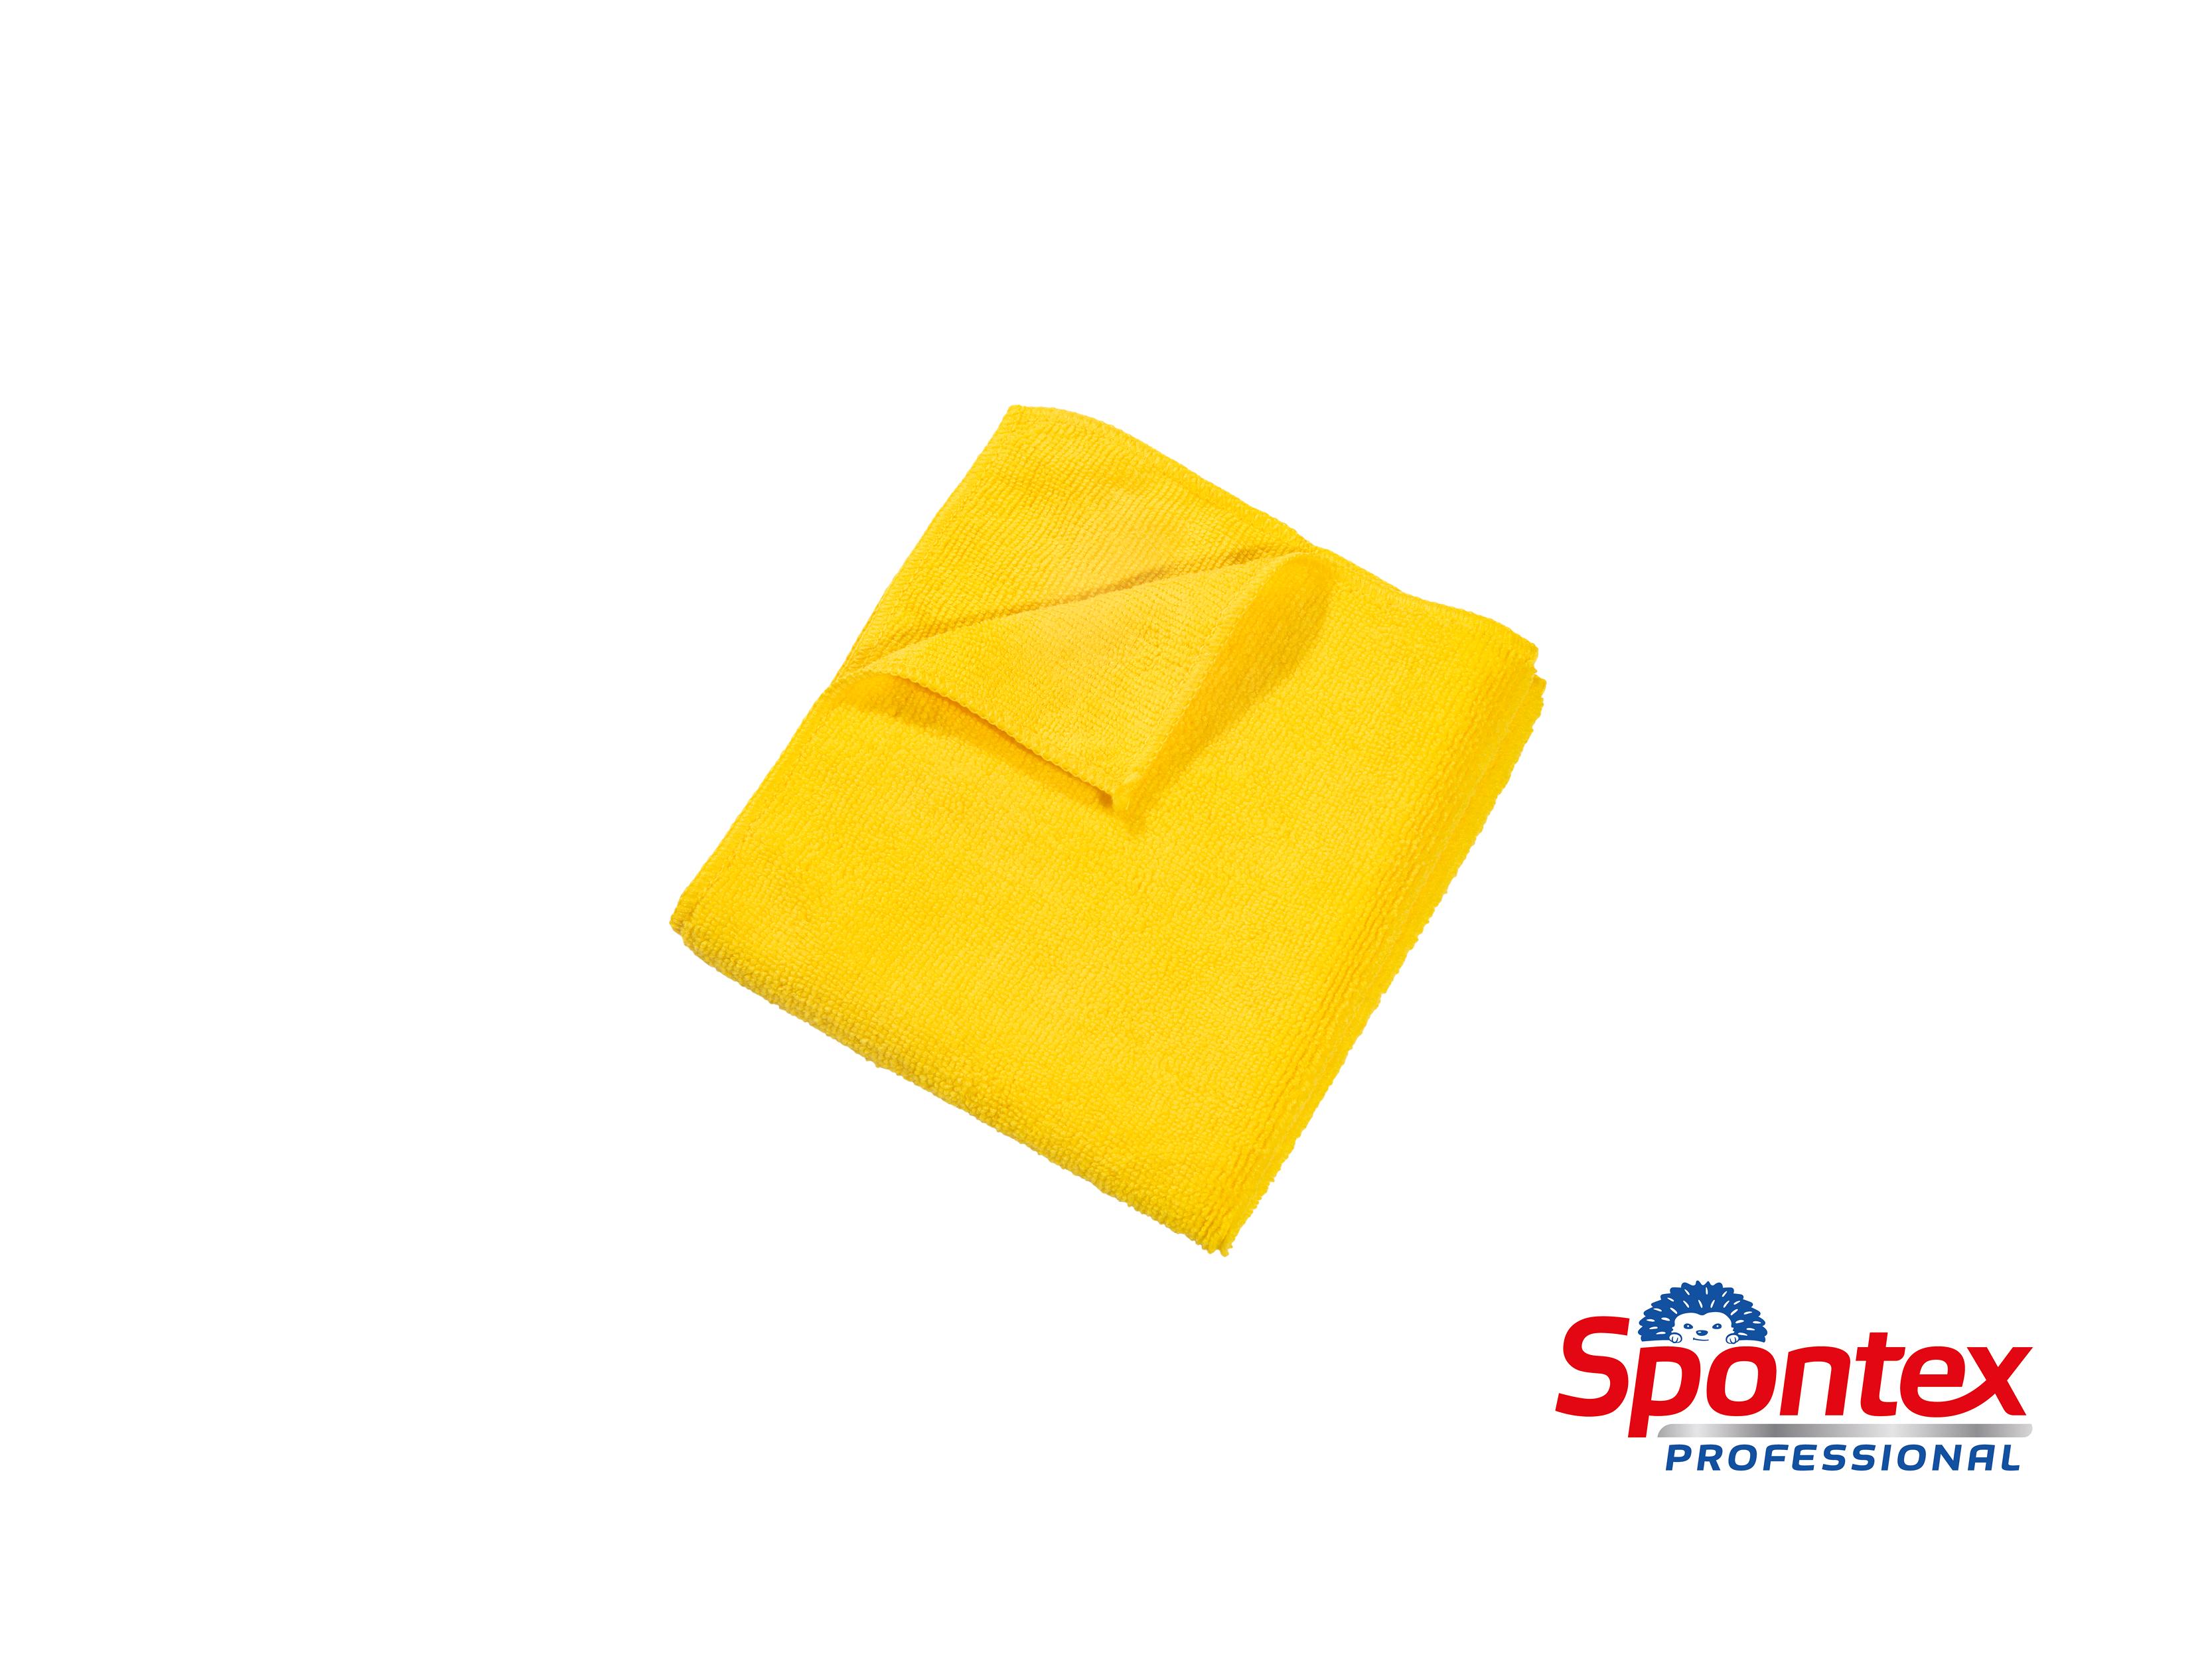 MF Pro Multiclean Yellow SPONTEX